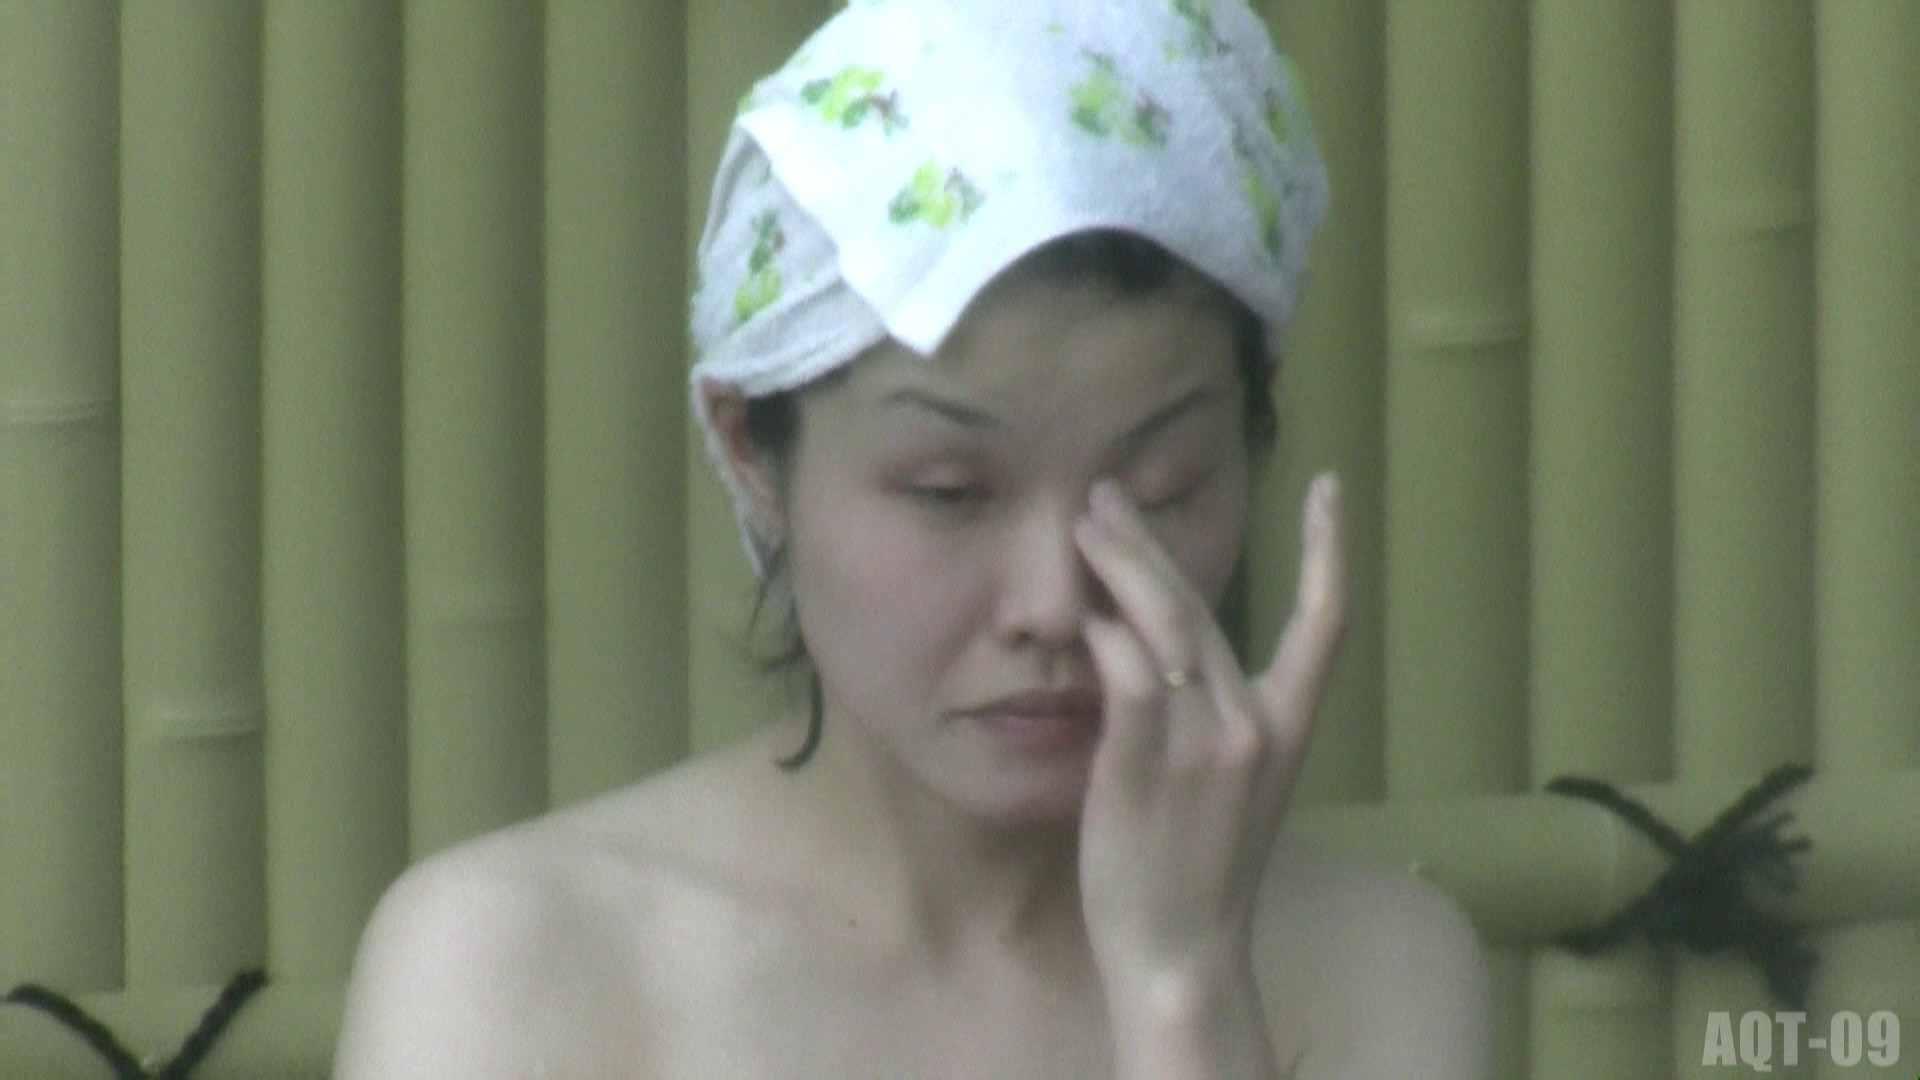 Aquaな露天風呂Vol.786 盗撮師作品  79pic 72